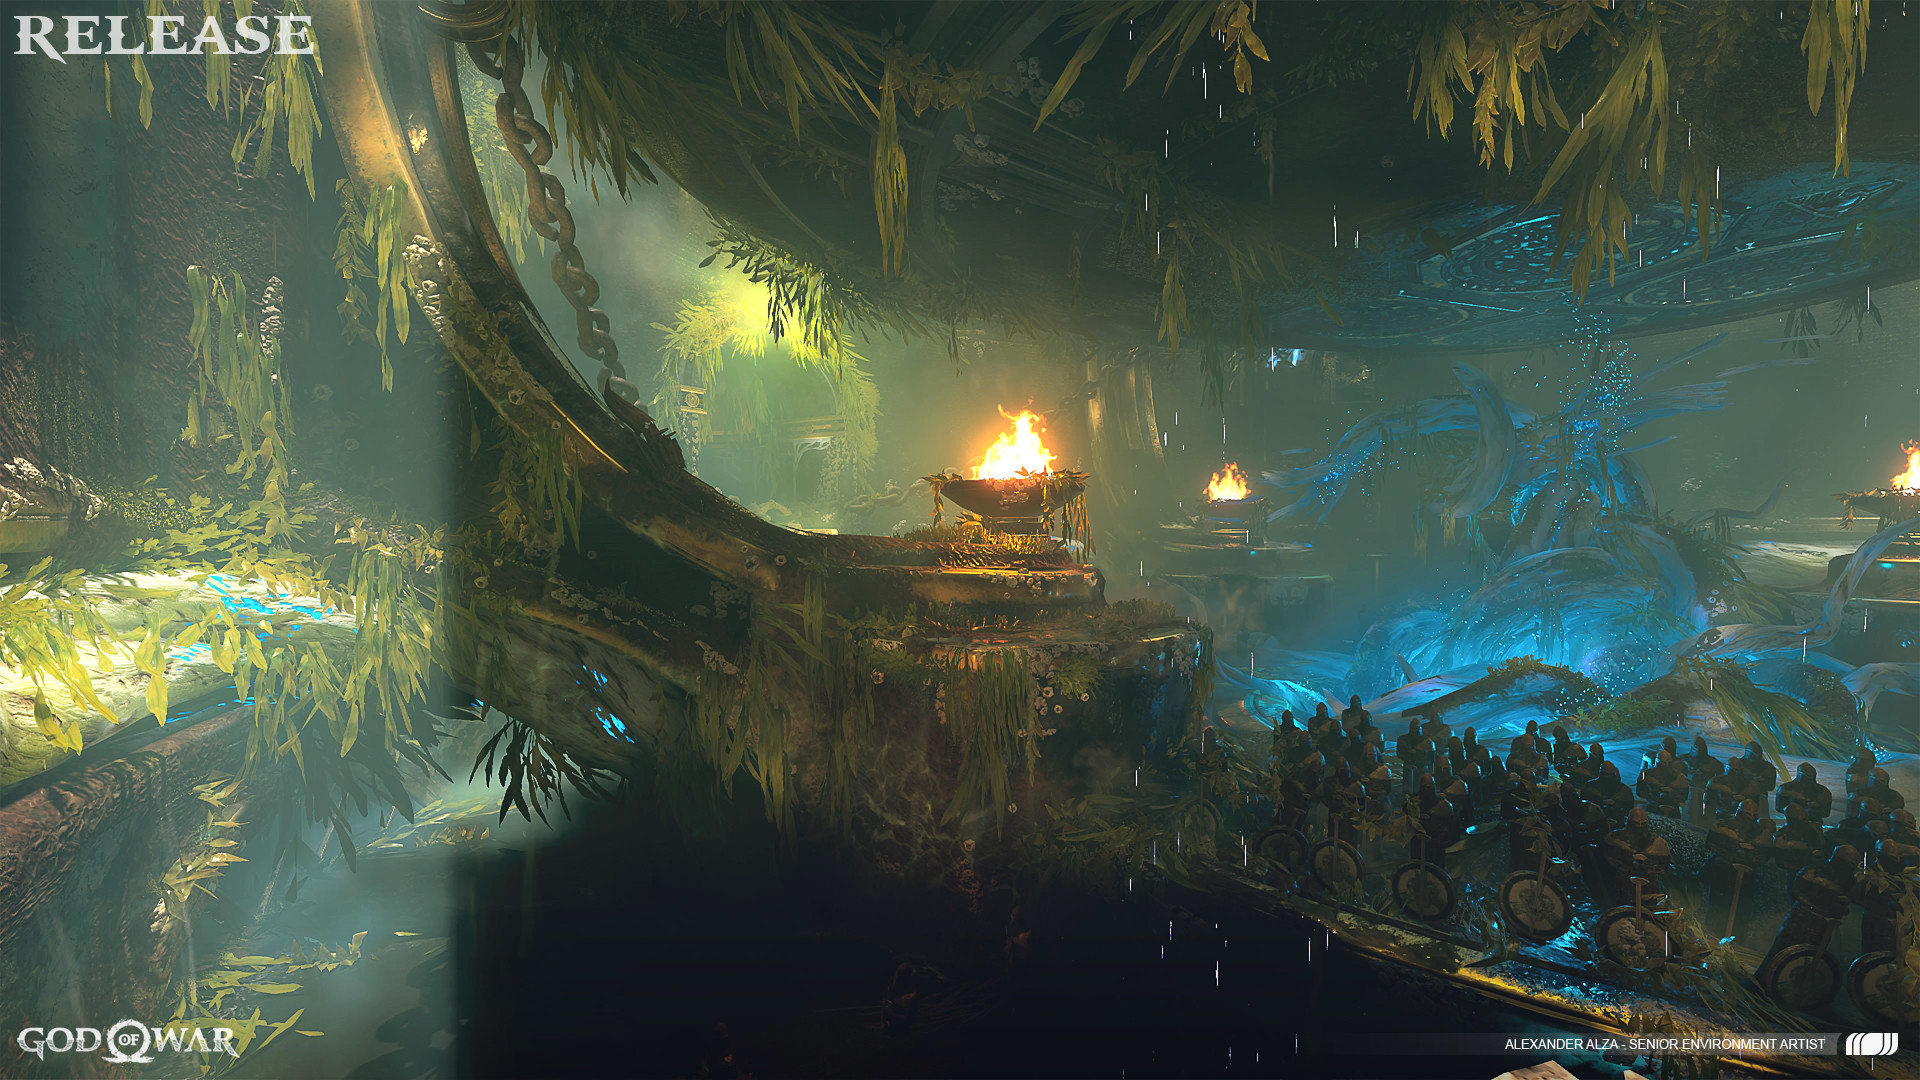 Alexander alza templefacade 04